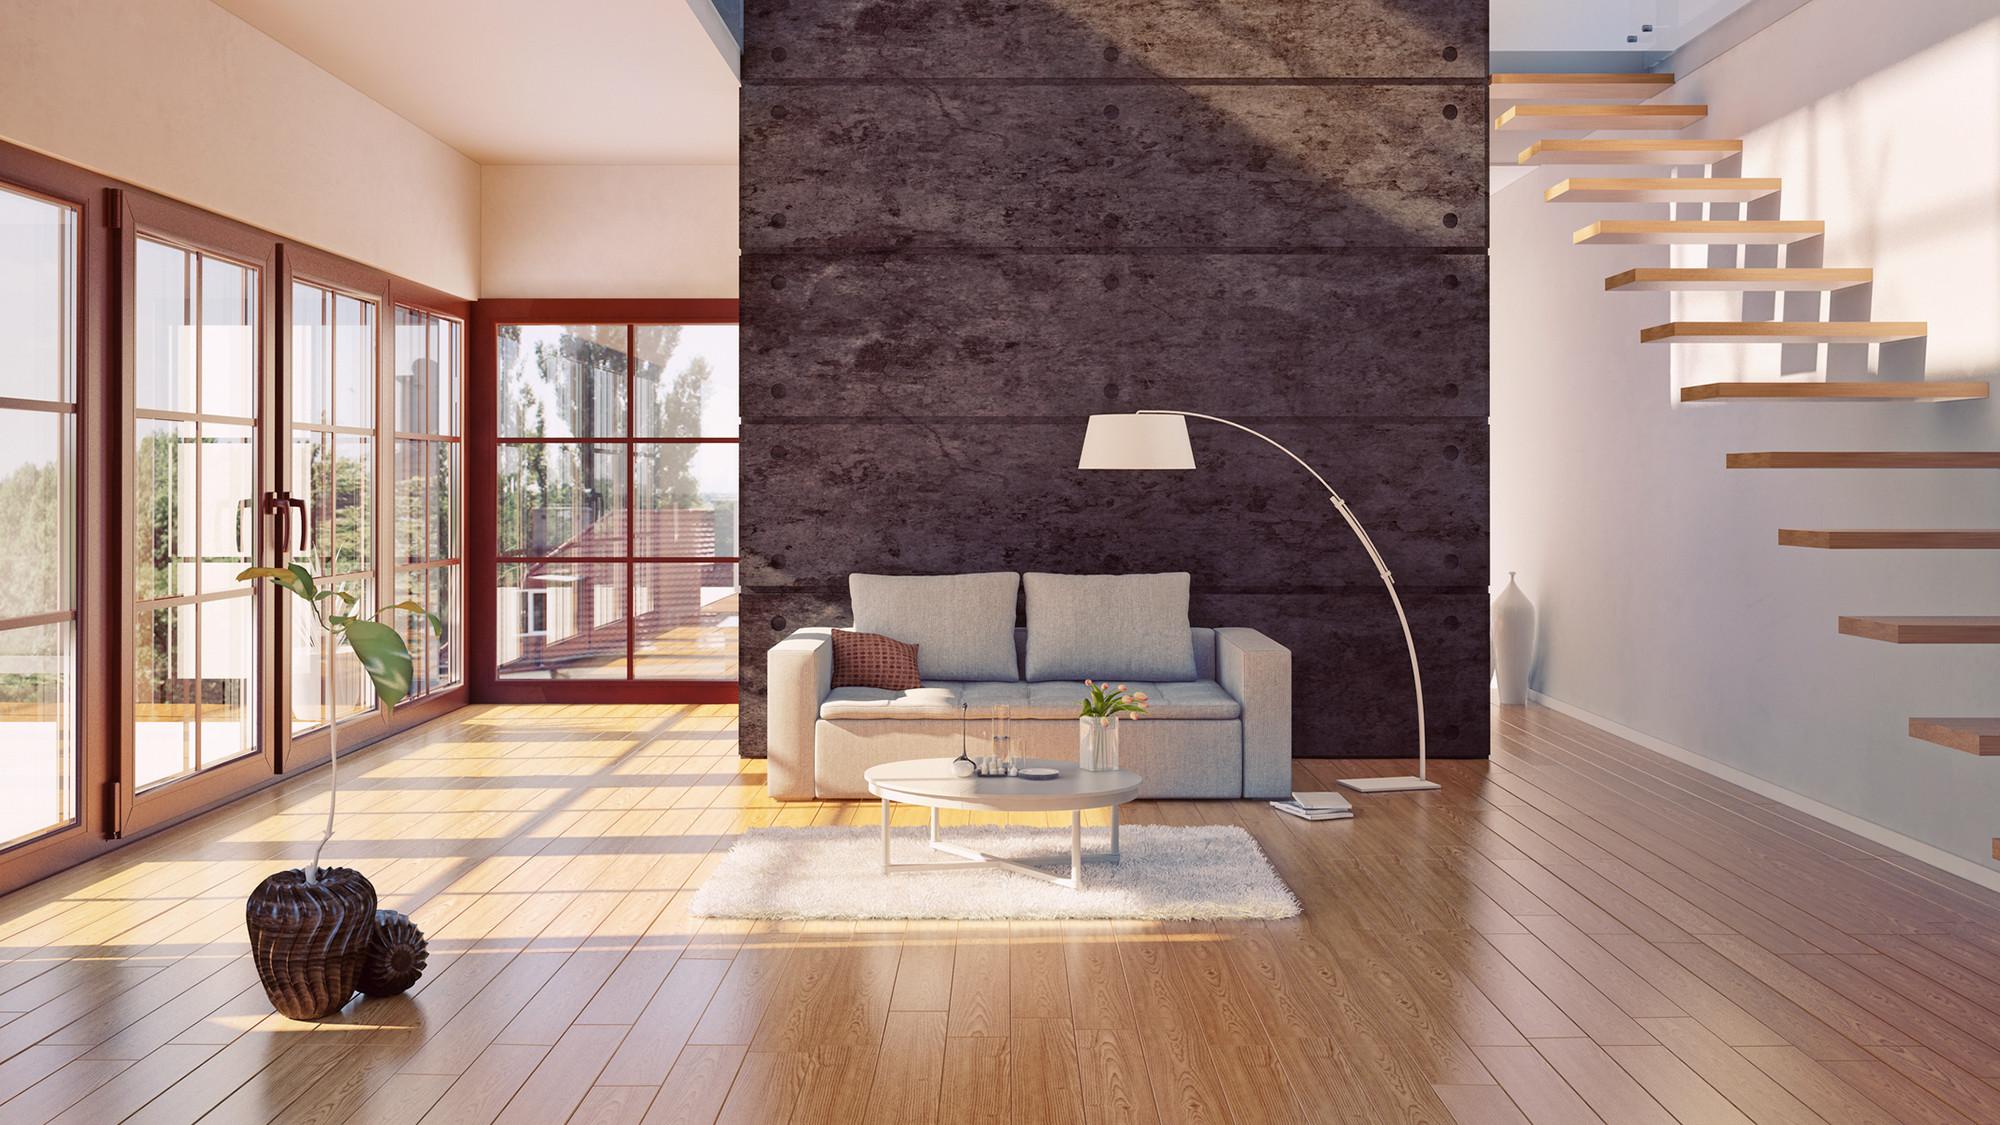 engineered hardwood flooring made in usa of do hardwood floors provide the best return on investment realtor coma with hardwood floors investment